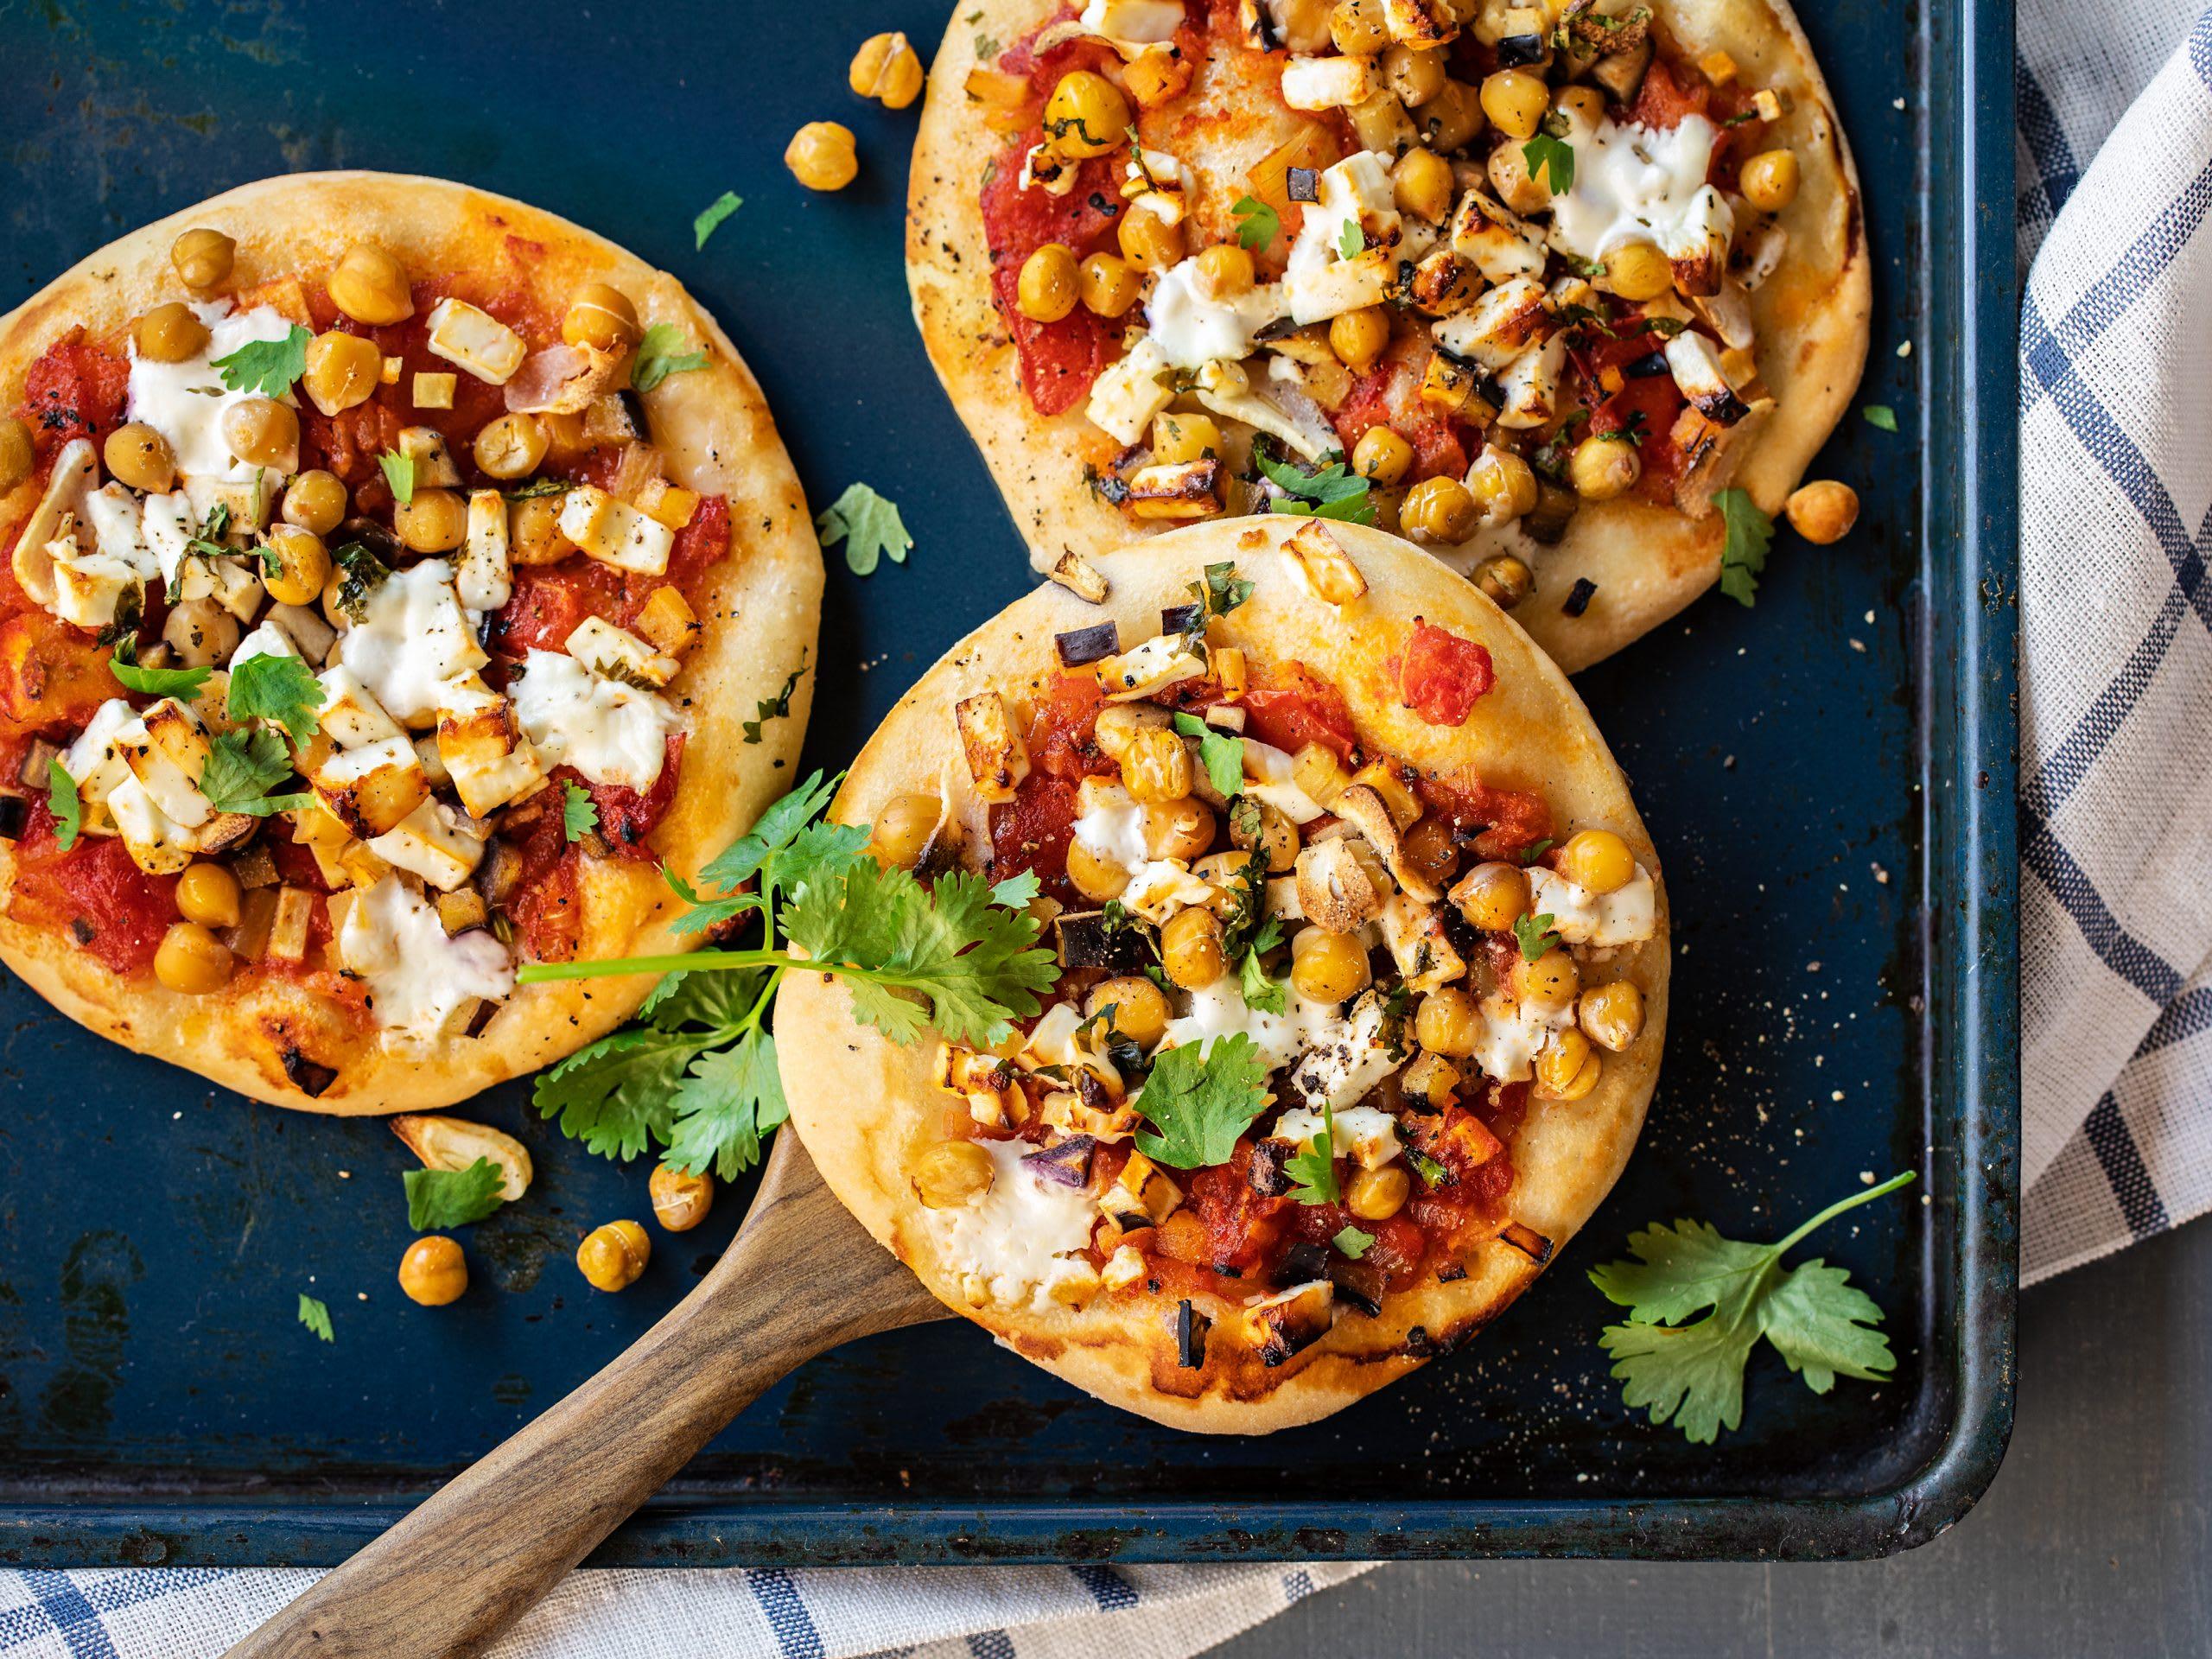 Kichererbsen-Frischkäse-Pizzette